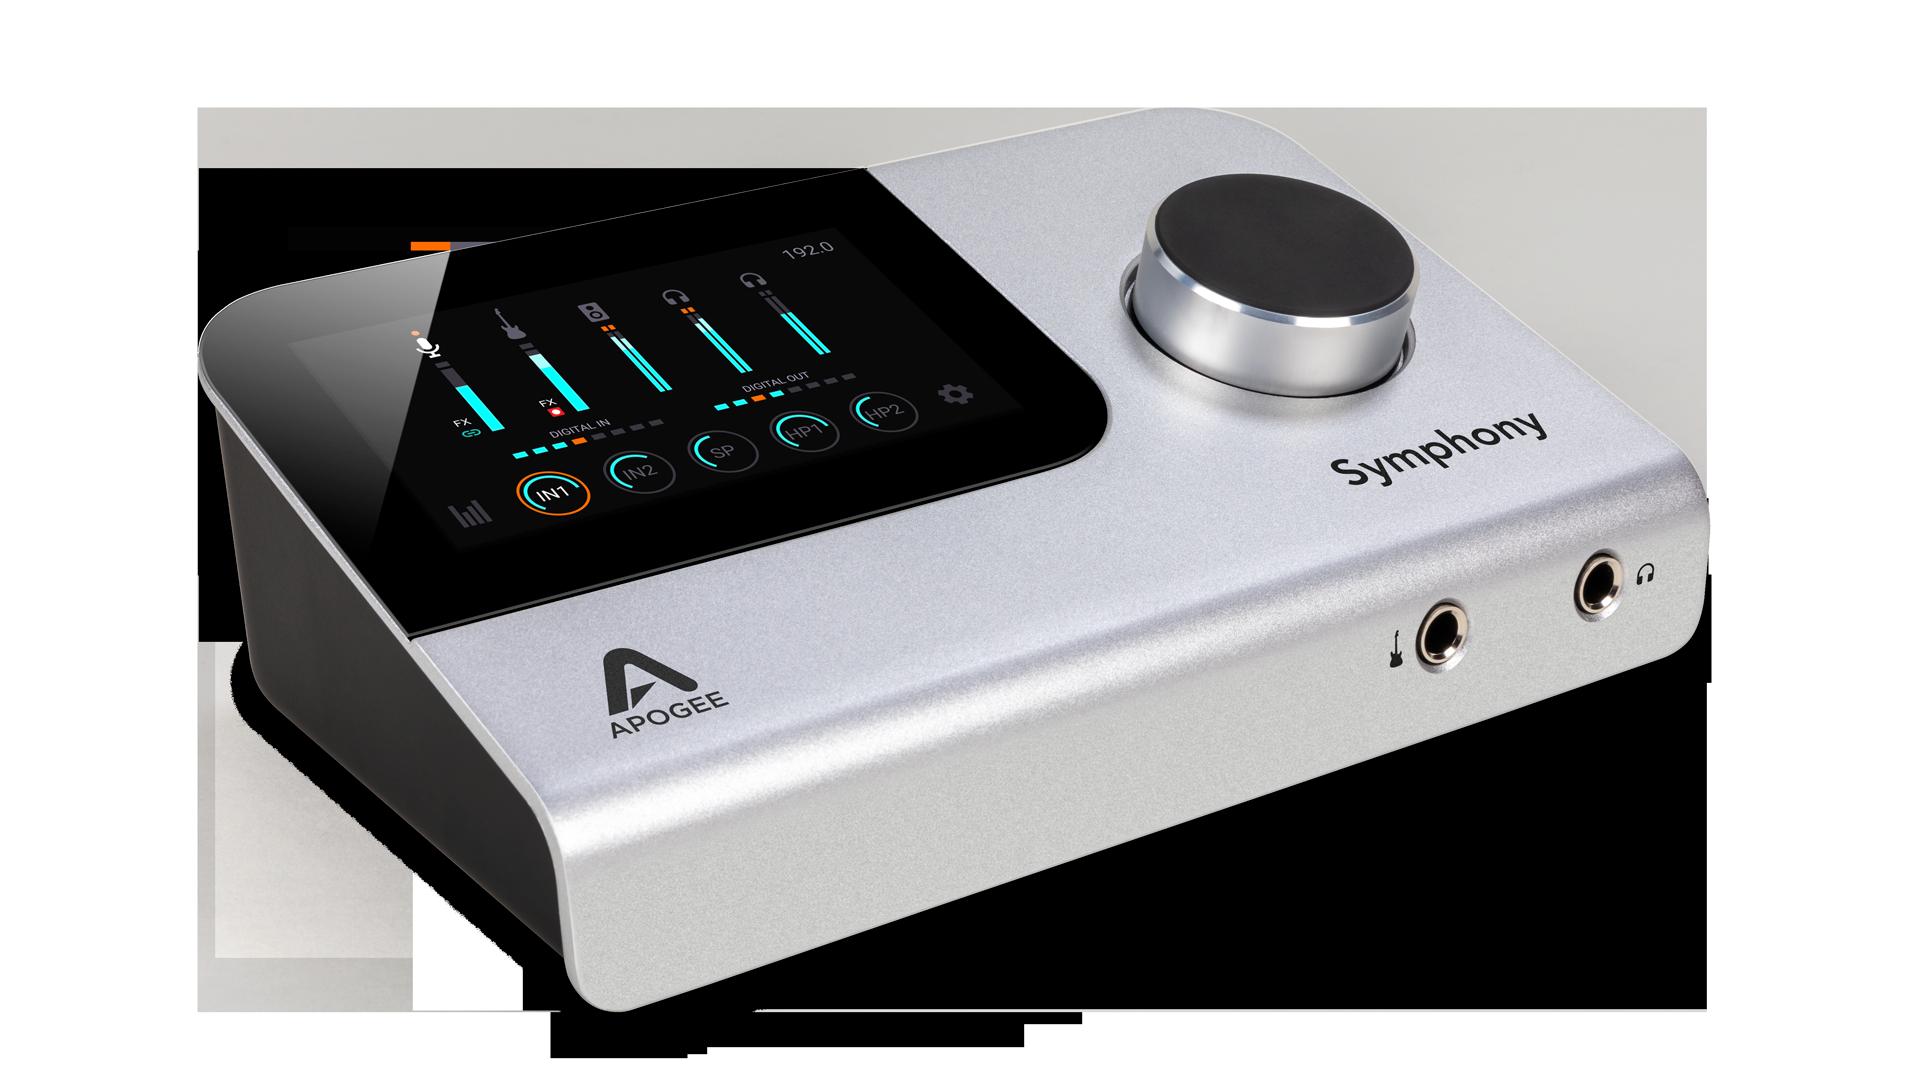 Apogee-Symphony-Desktop-34-Right-9Y1A0138-1920.png